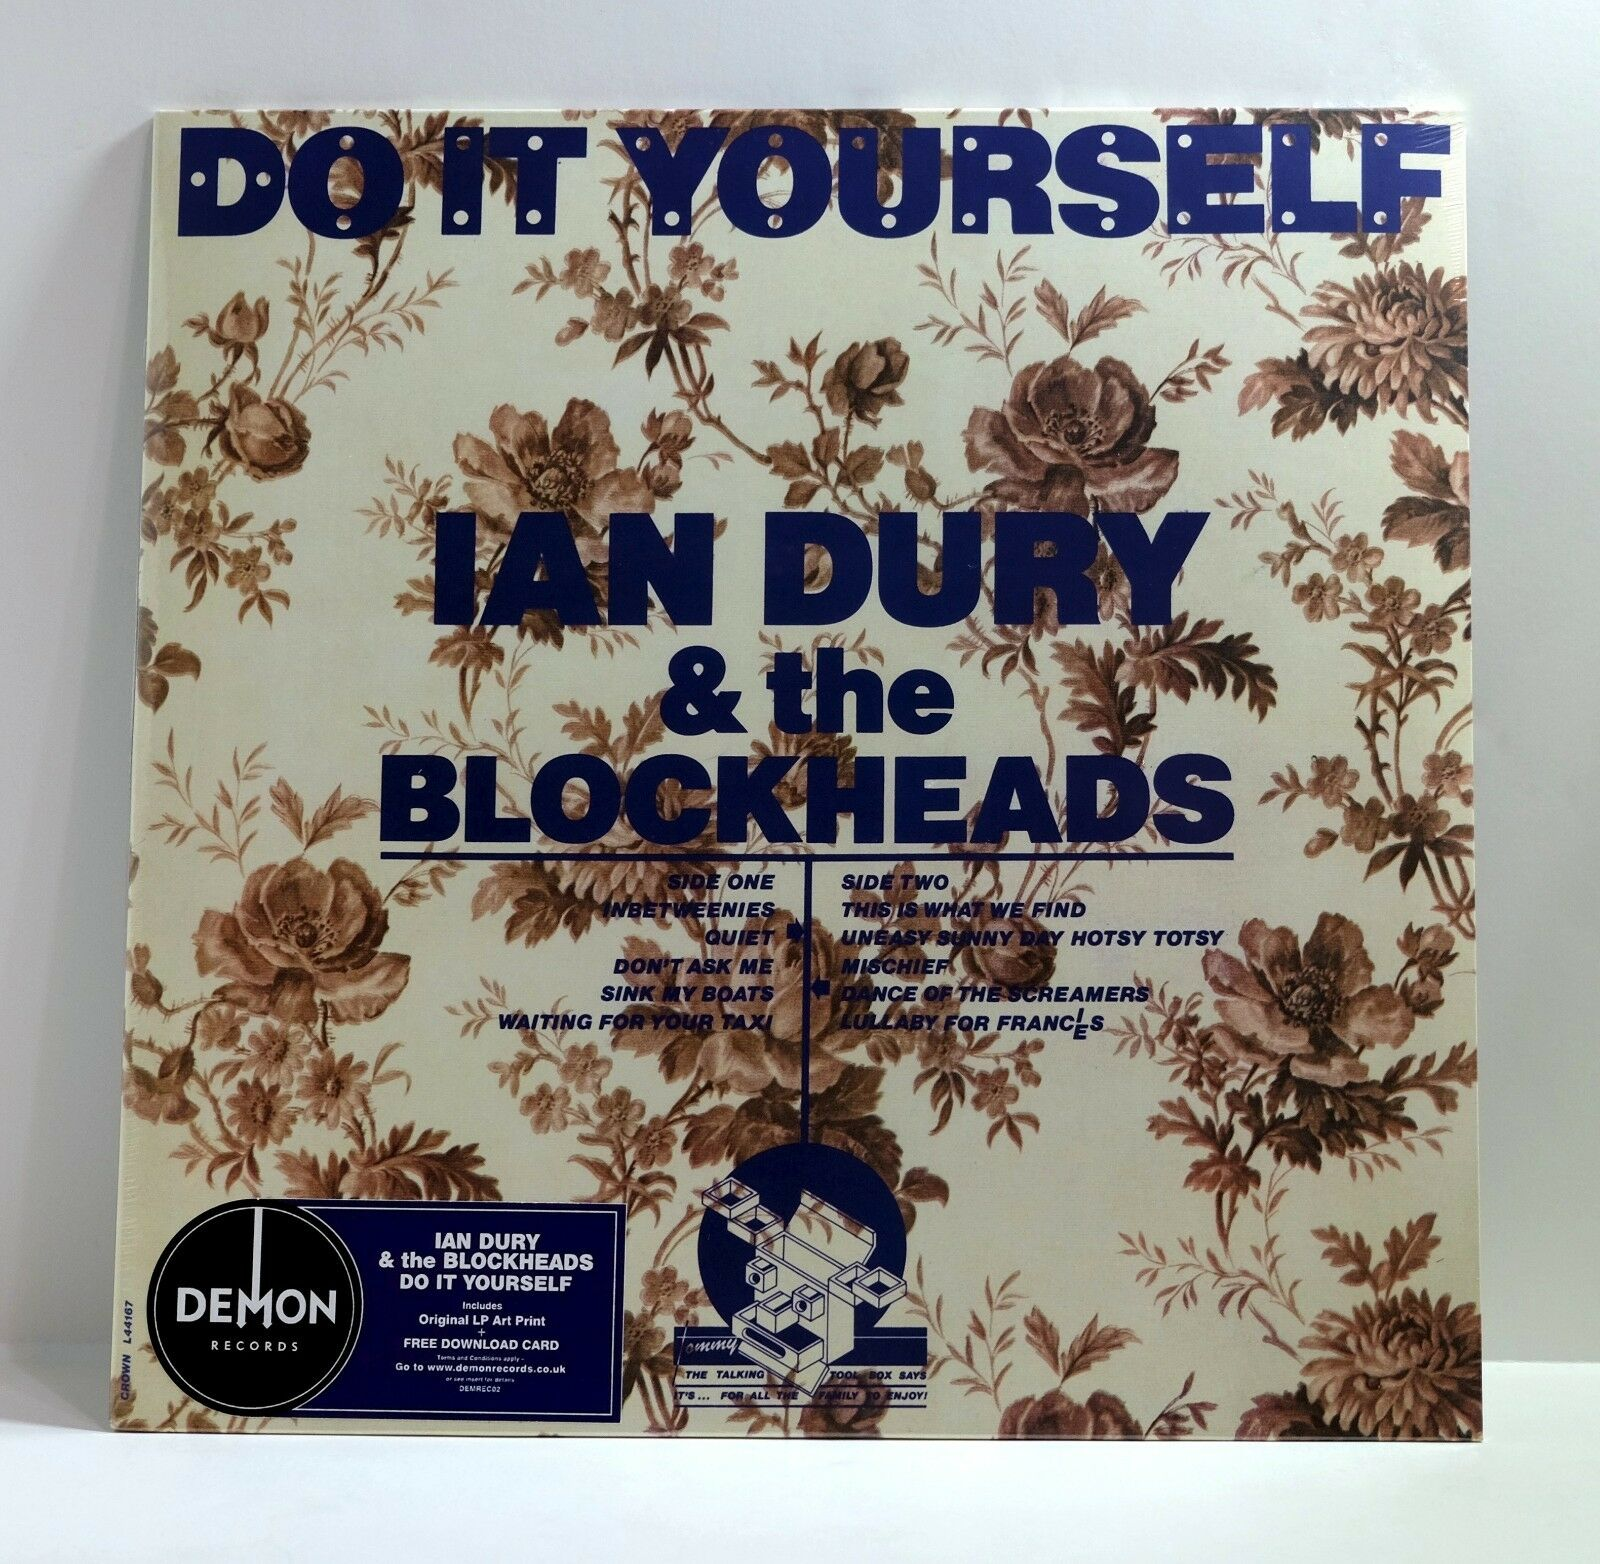 Do it yourself 5014797139299 by ian the blockheads dury vinyl resntentobalflowflowcomponentncel solutioingenieria Images